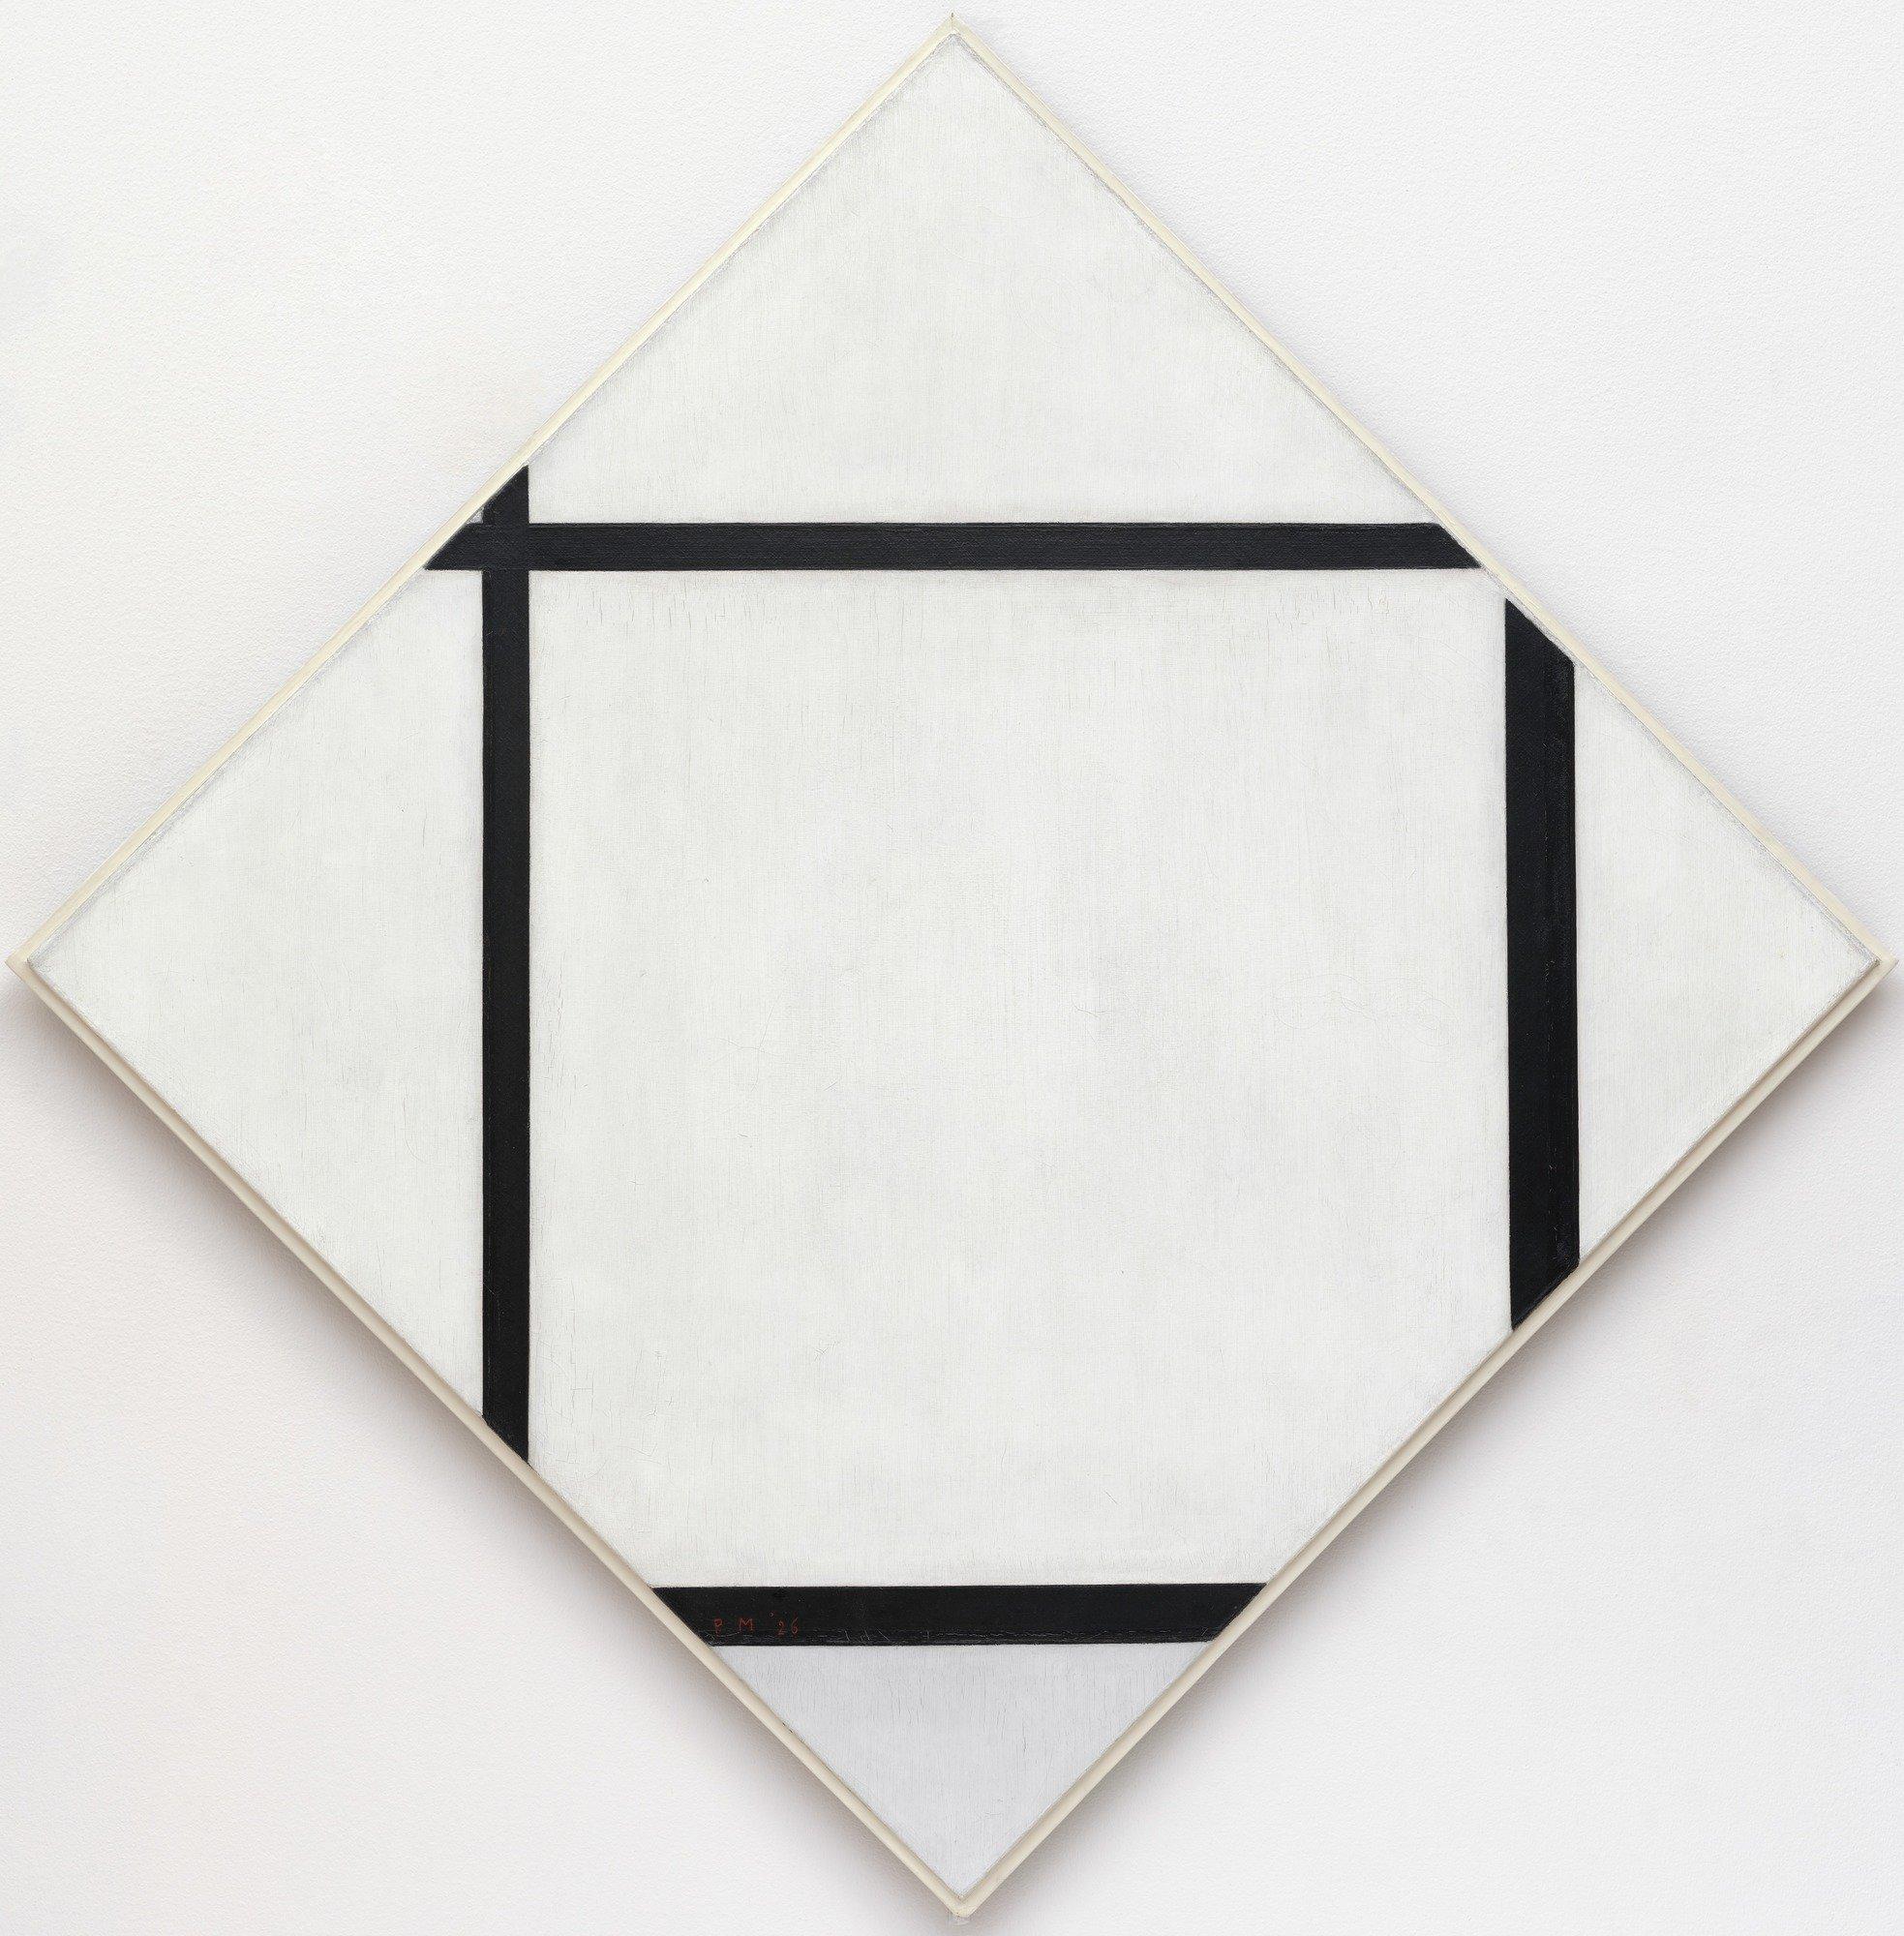 Tableau I Piet Mondrian Canvas print